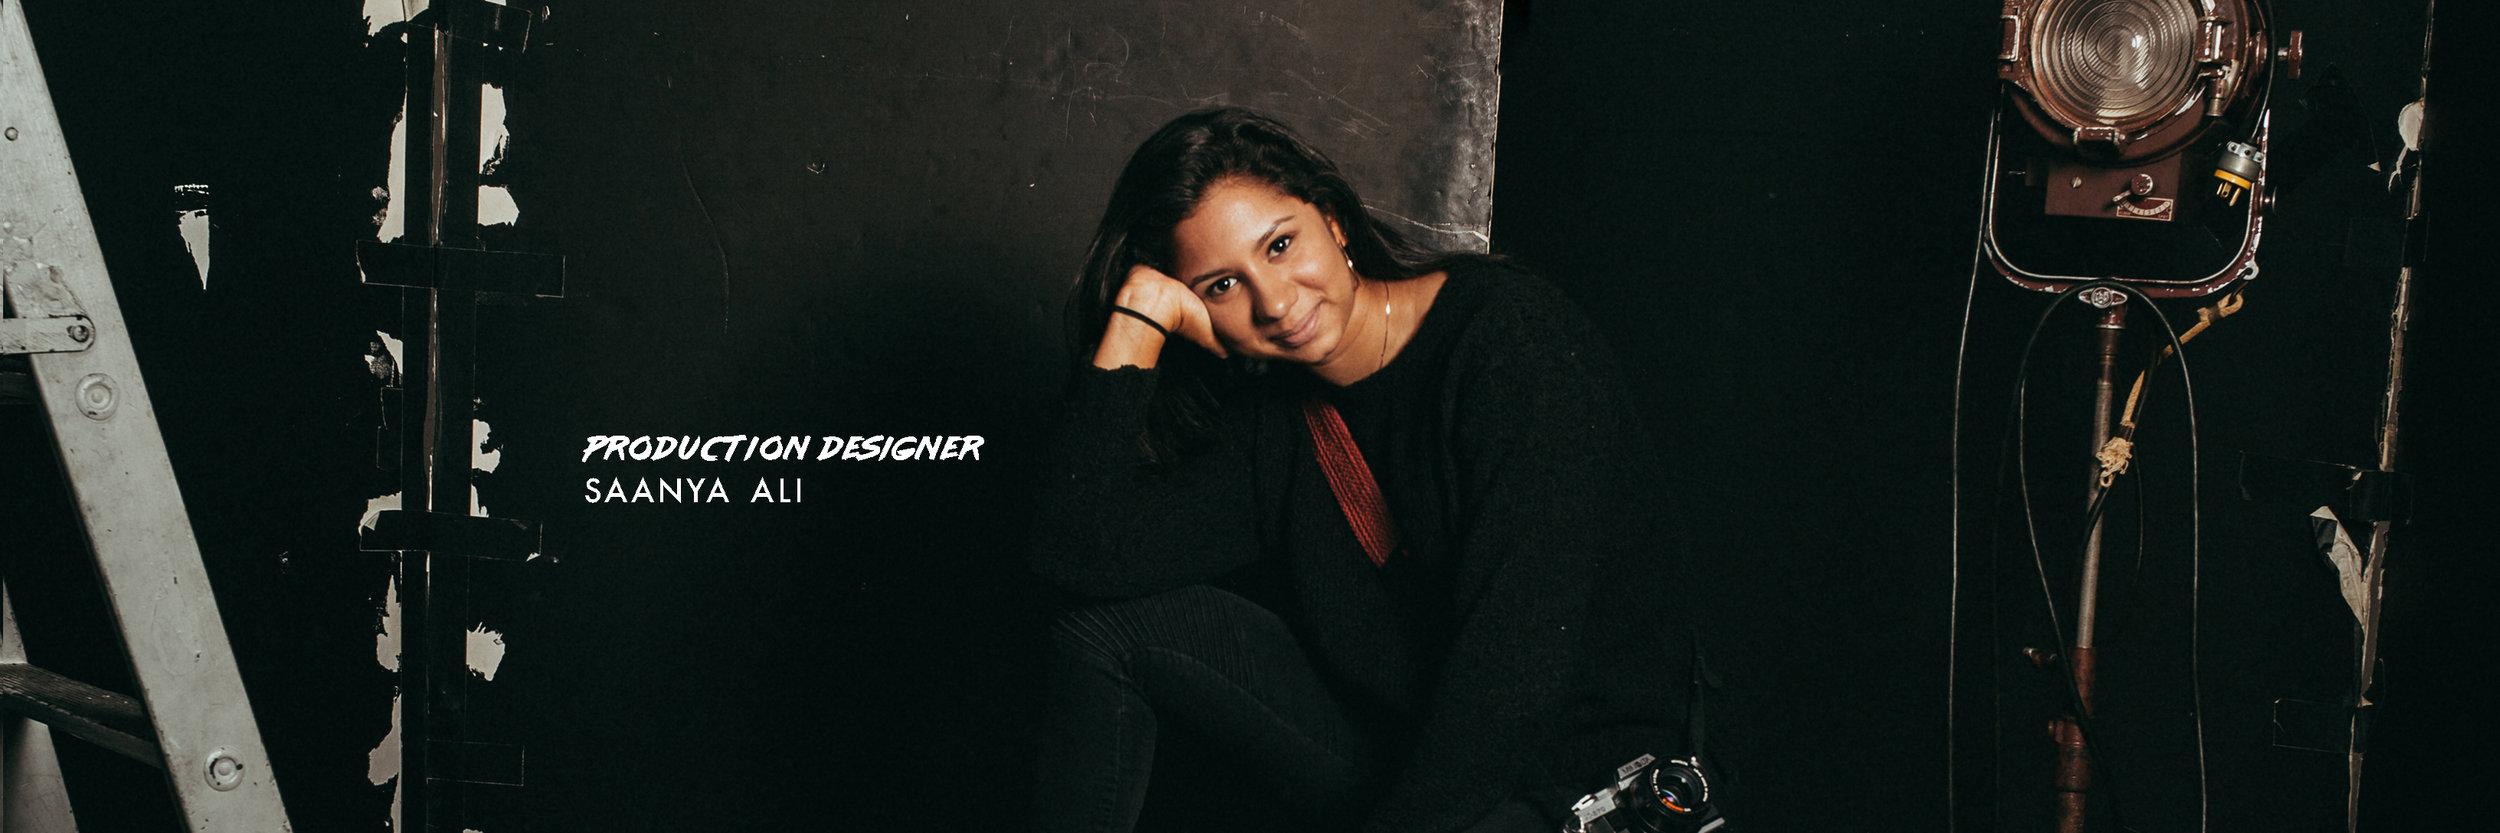 production designer, saanya ali